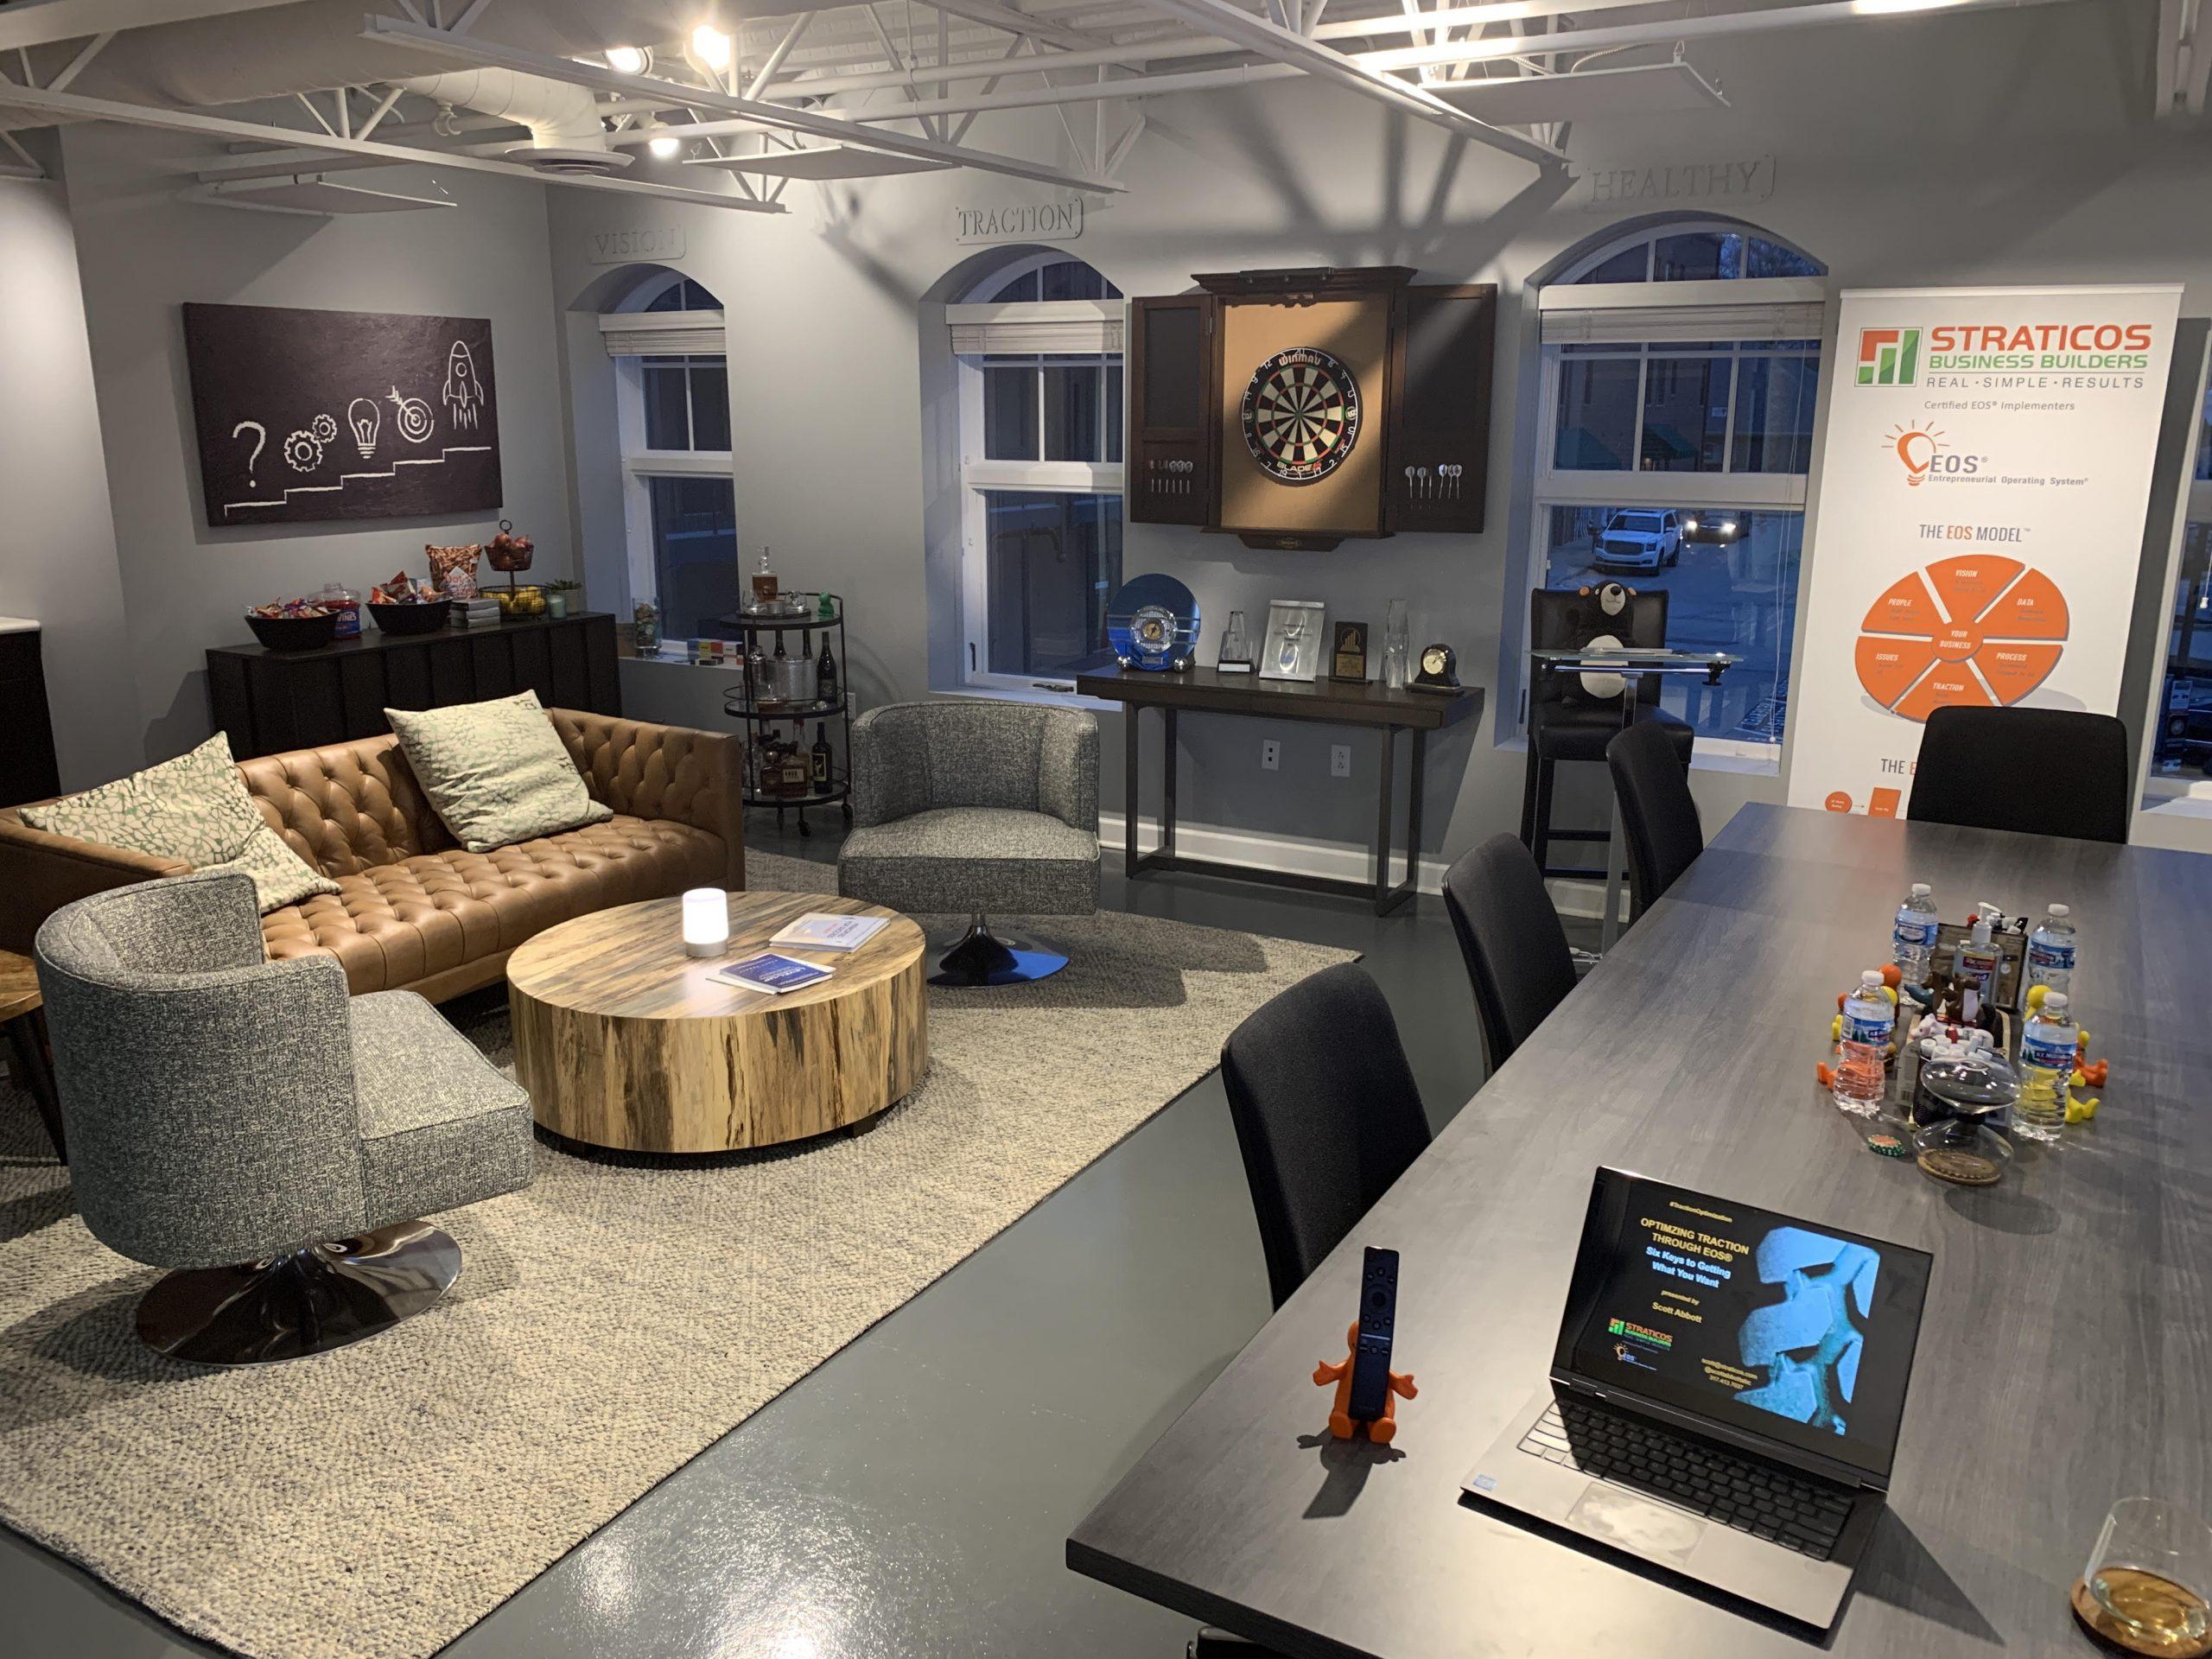 The Traction Optimization Studio